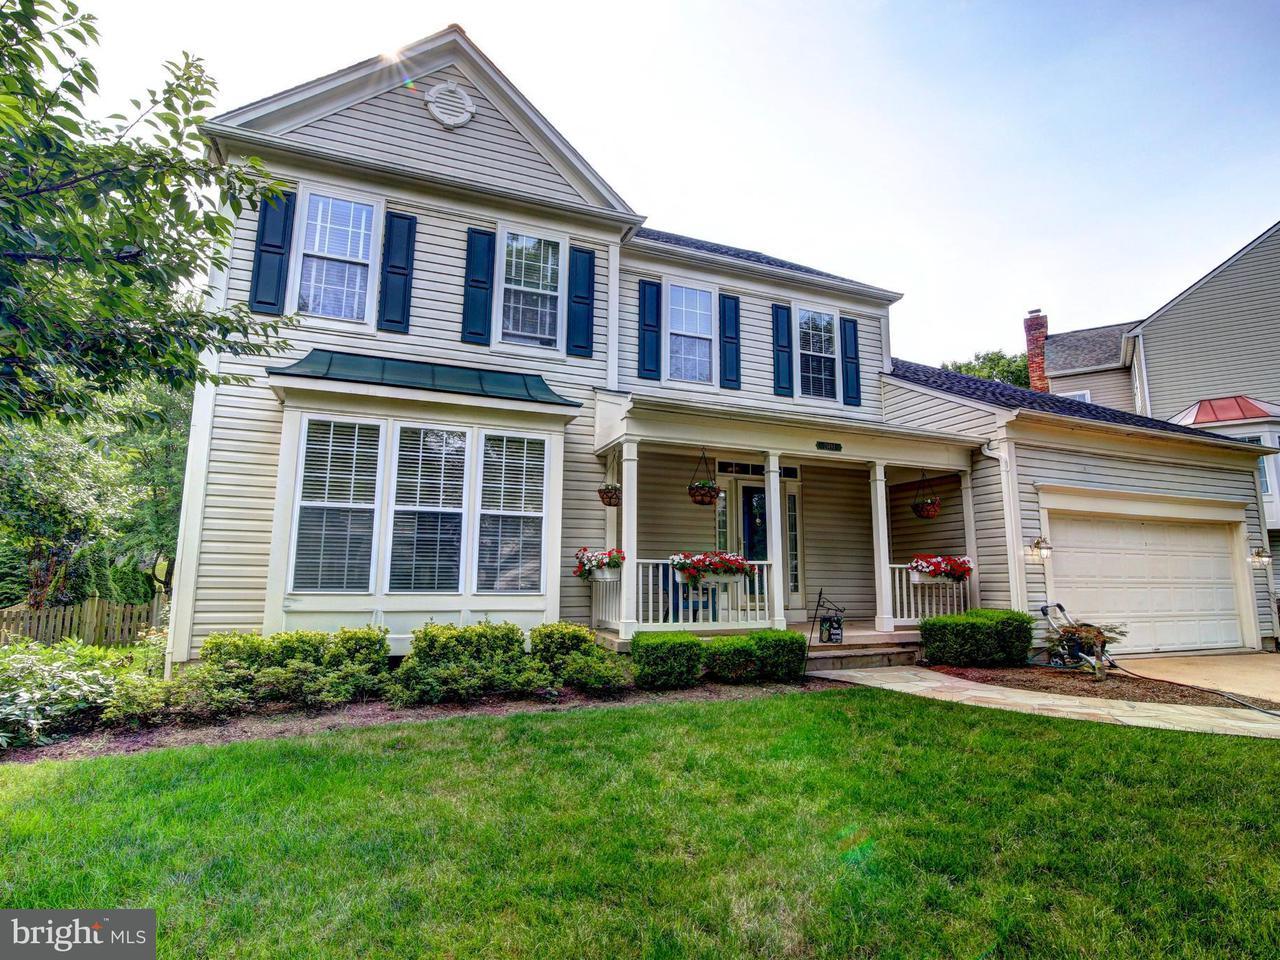 独户住宅 为 销售 在 21493 HEARTHSTONE Court 21493 HEARTHSTONE Court Broadlands, 弗吉尼亚州 20148 美国